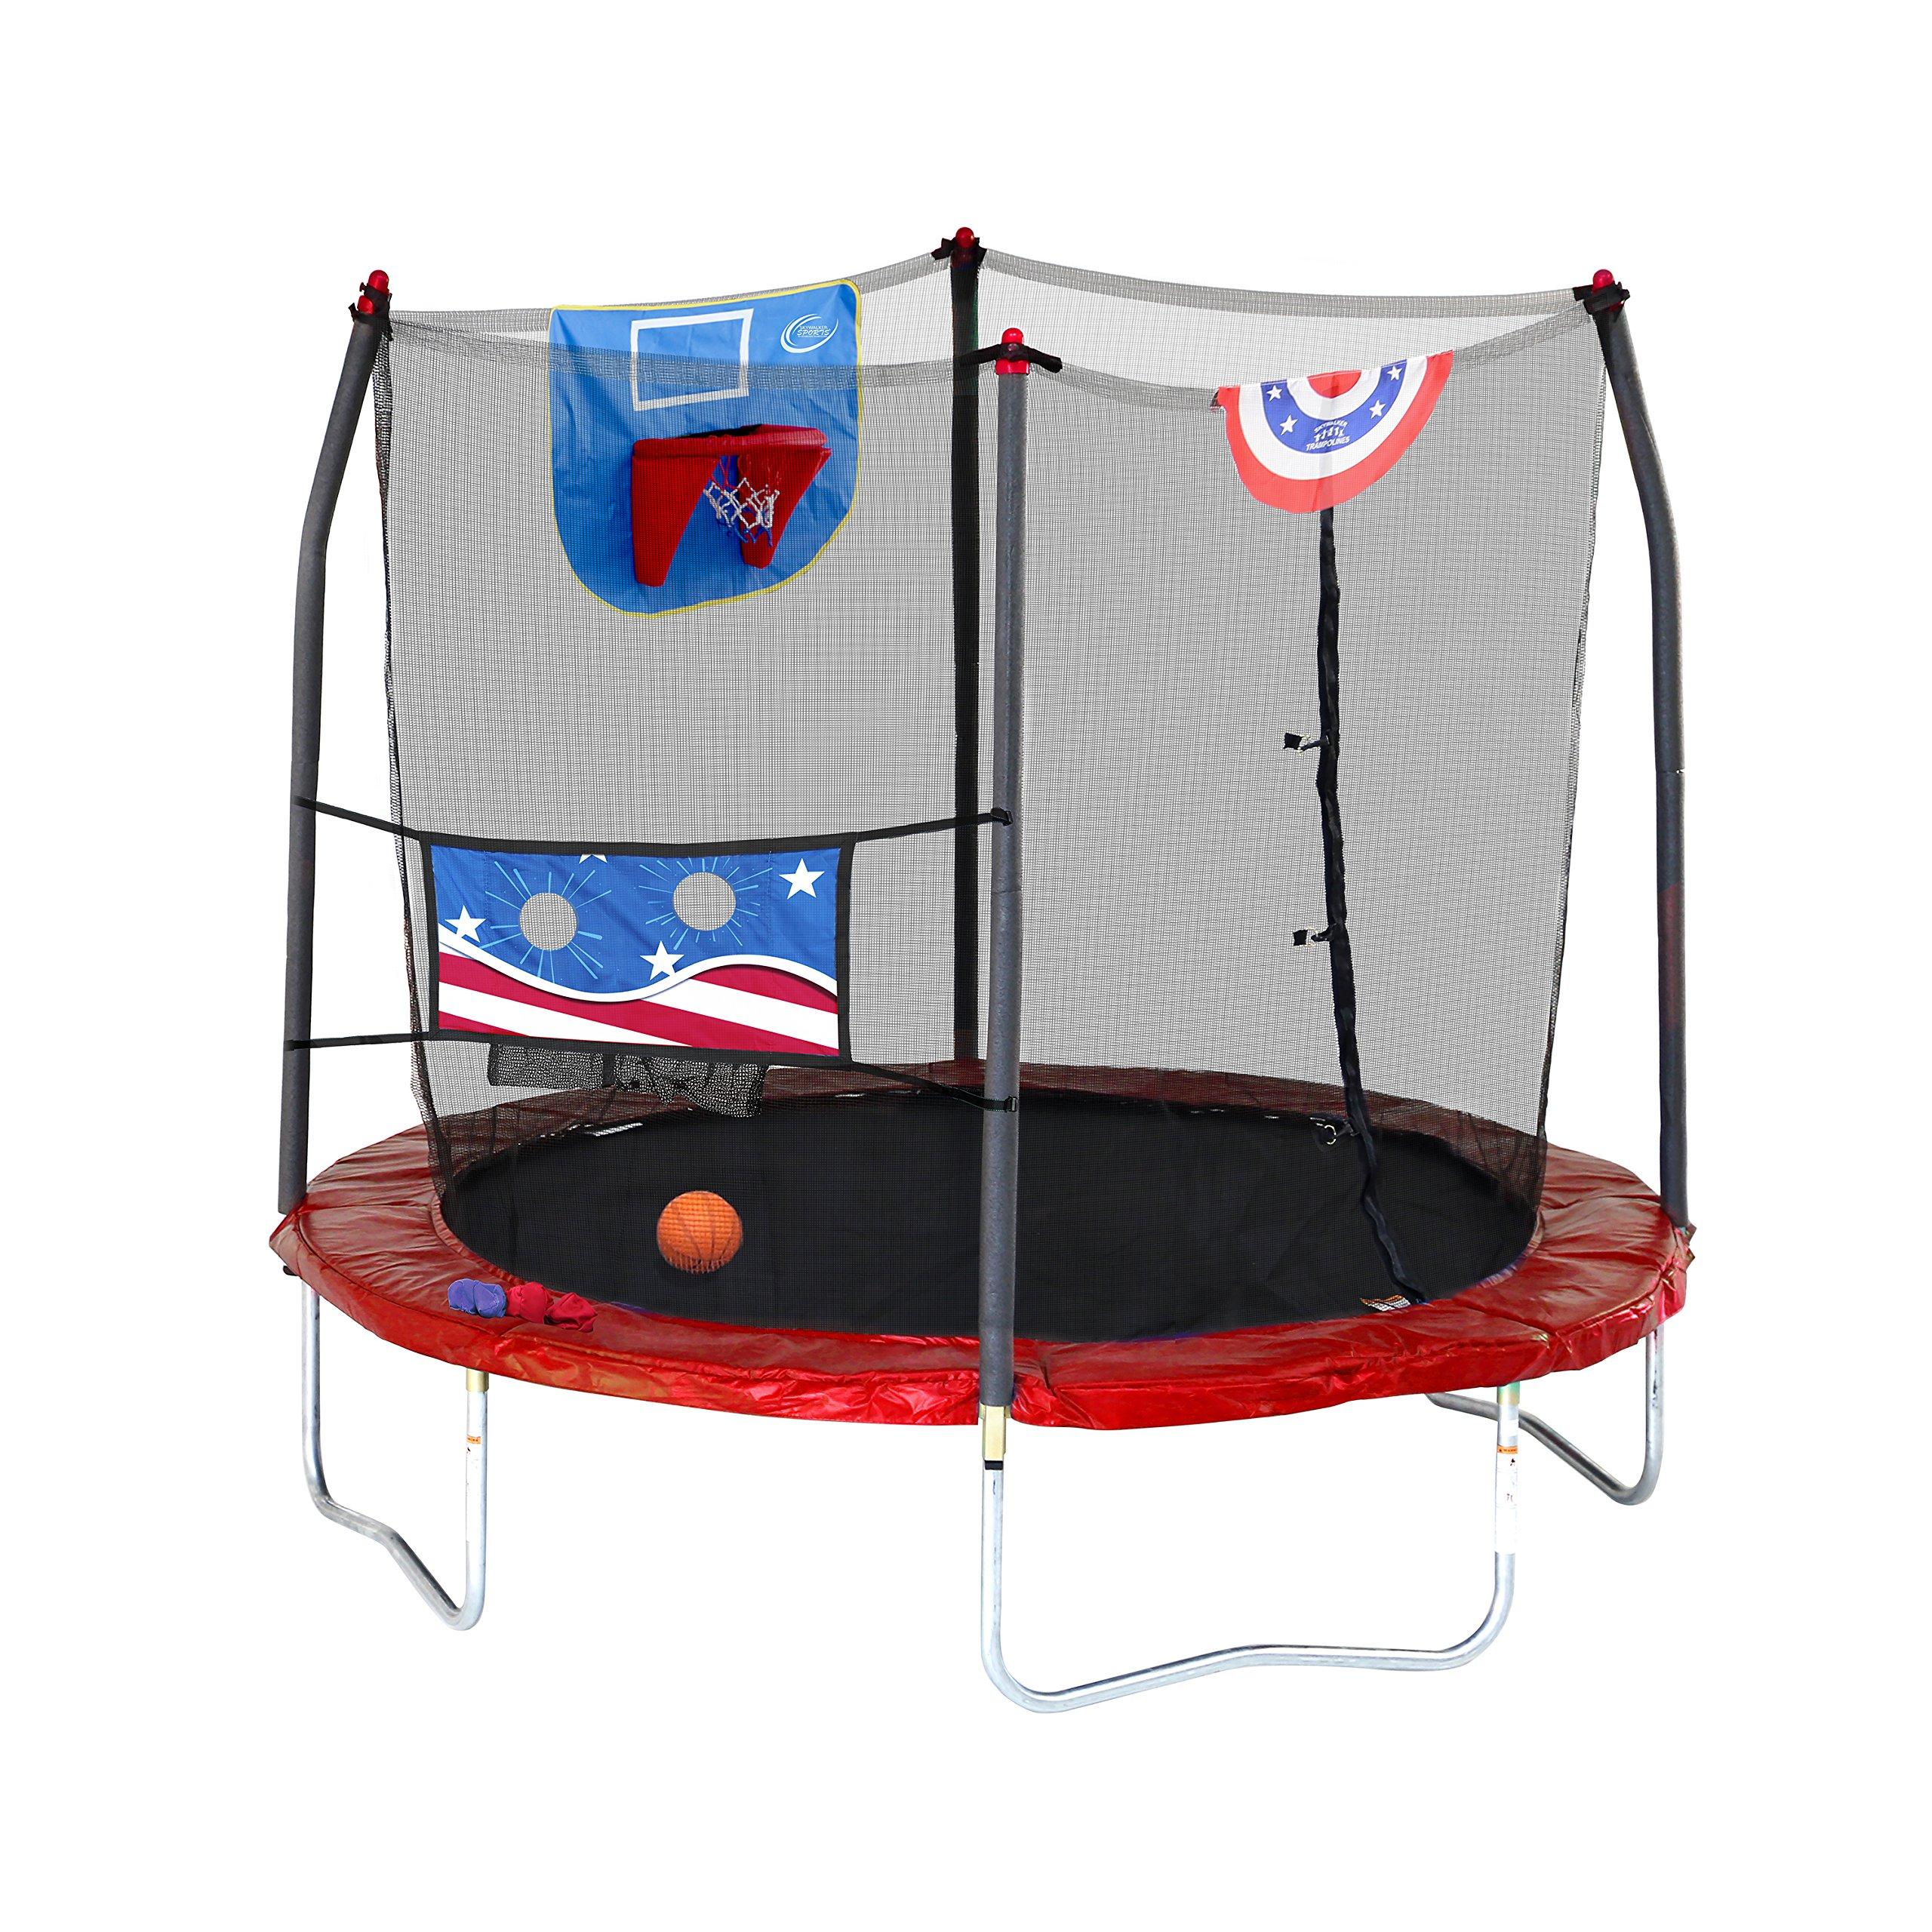 Skywalker Trampolines Stars & Stripes Jump N' Dunk 8' Trampoline with Safety Enclosure Basketball Hoop by Skywalker Trampolines